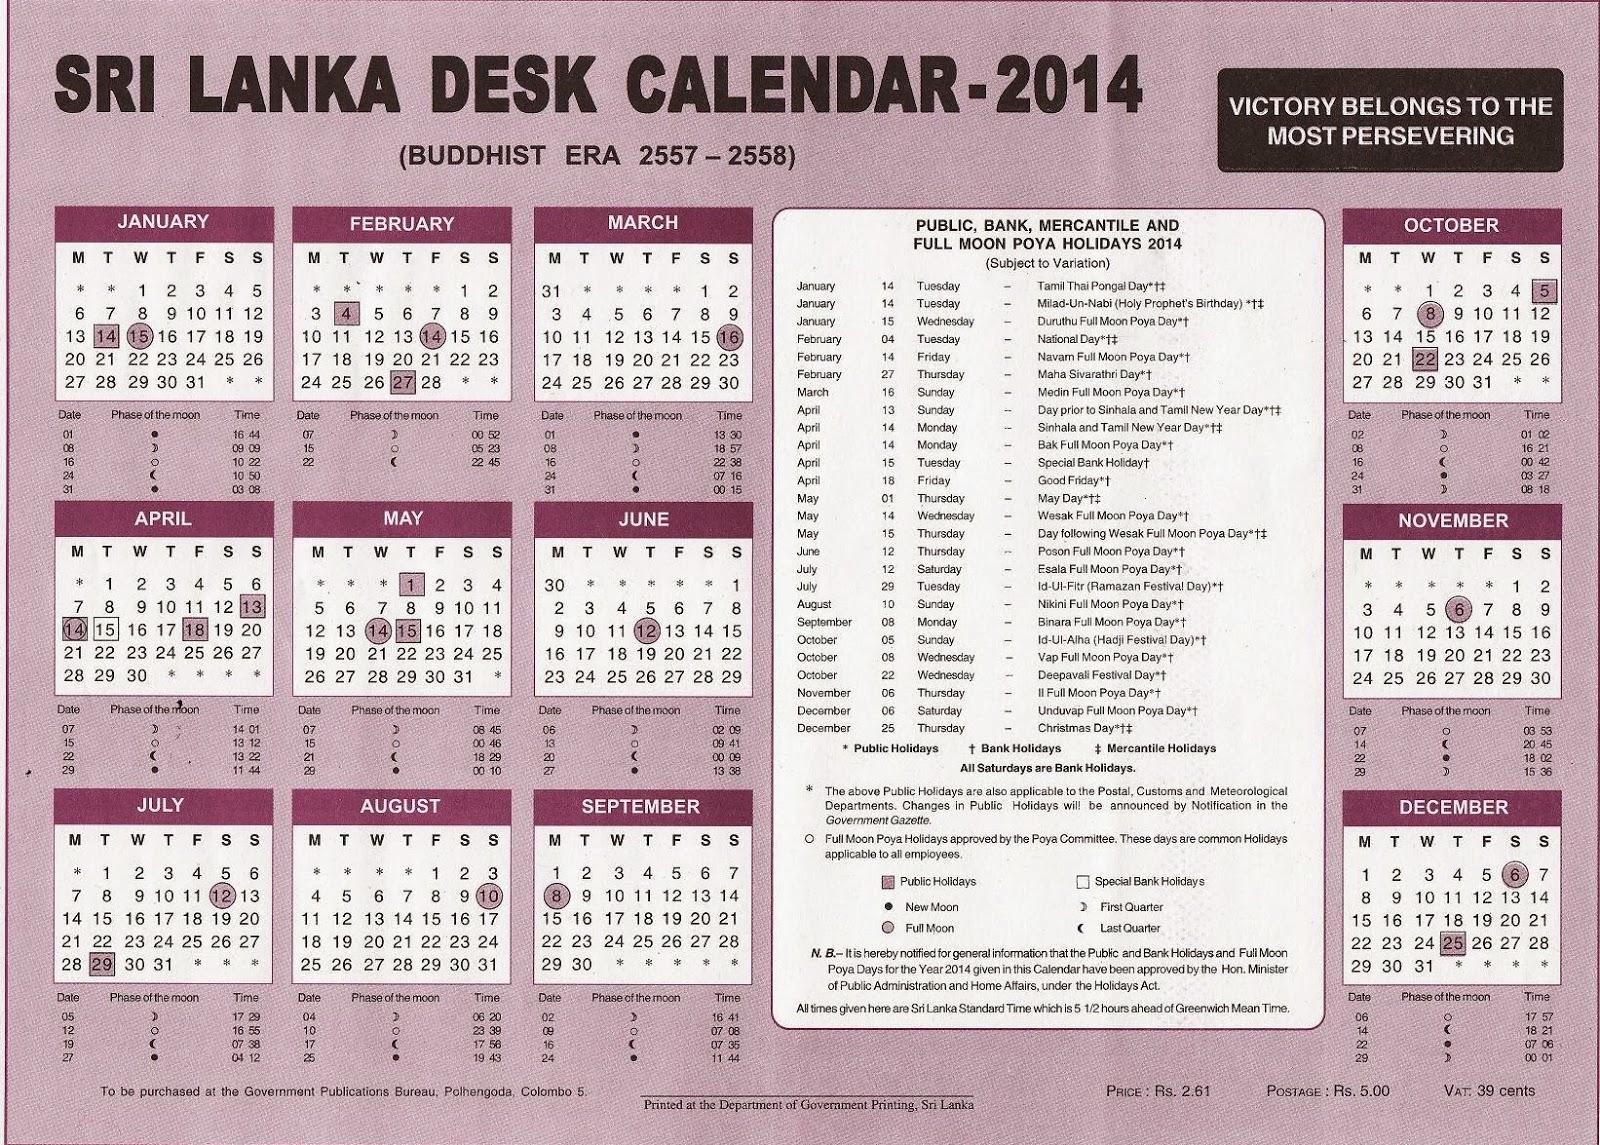 Jan 16-19 - Mahayana New Year Feb 8 - Parinirvana - Nirvana Day Feb ...